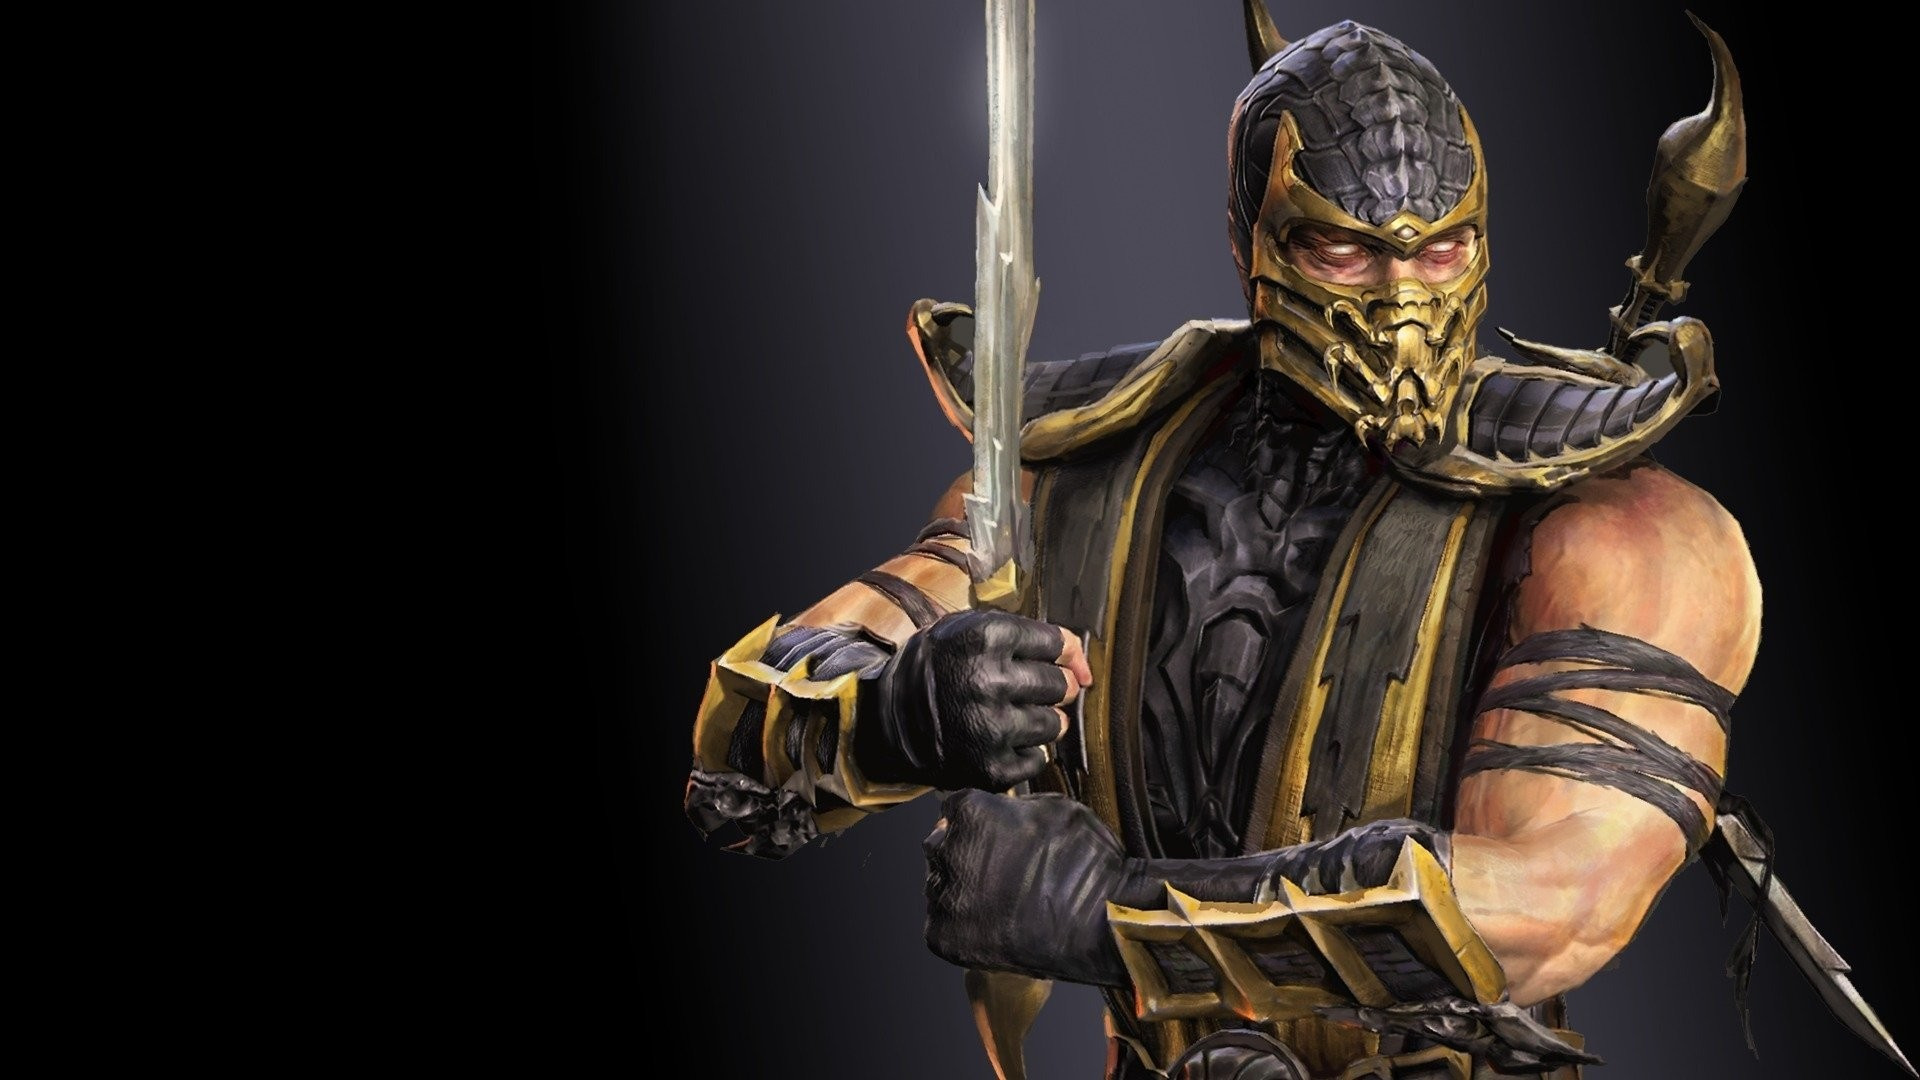 HD Wallpaper   Background ID:319995. Video Game Mortal Kombat. 52  Like